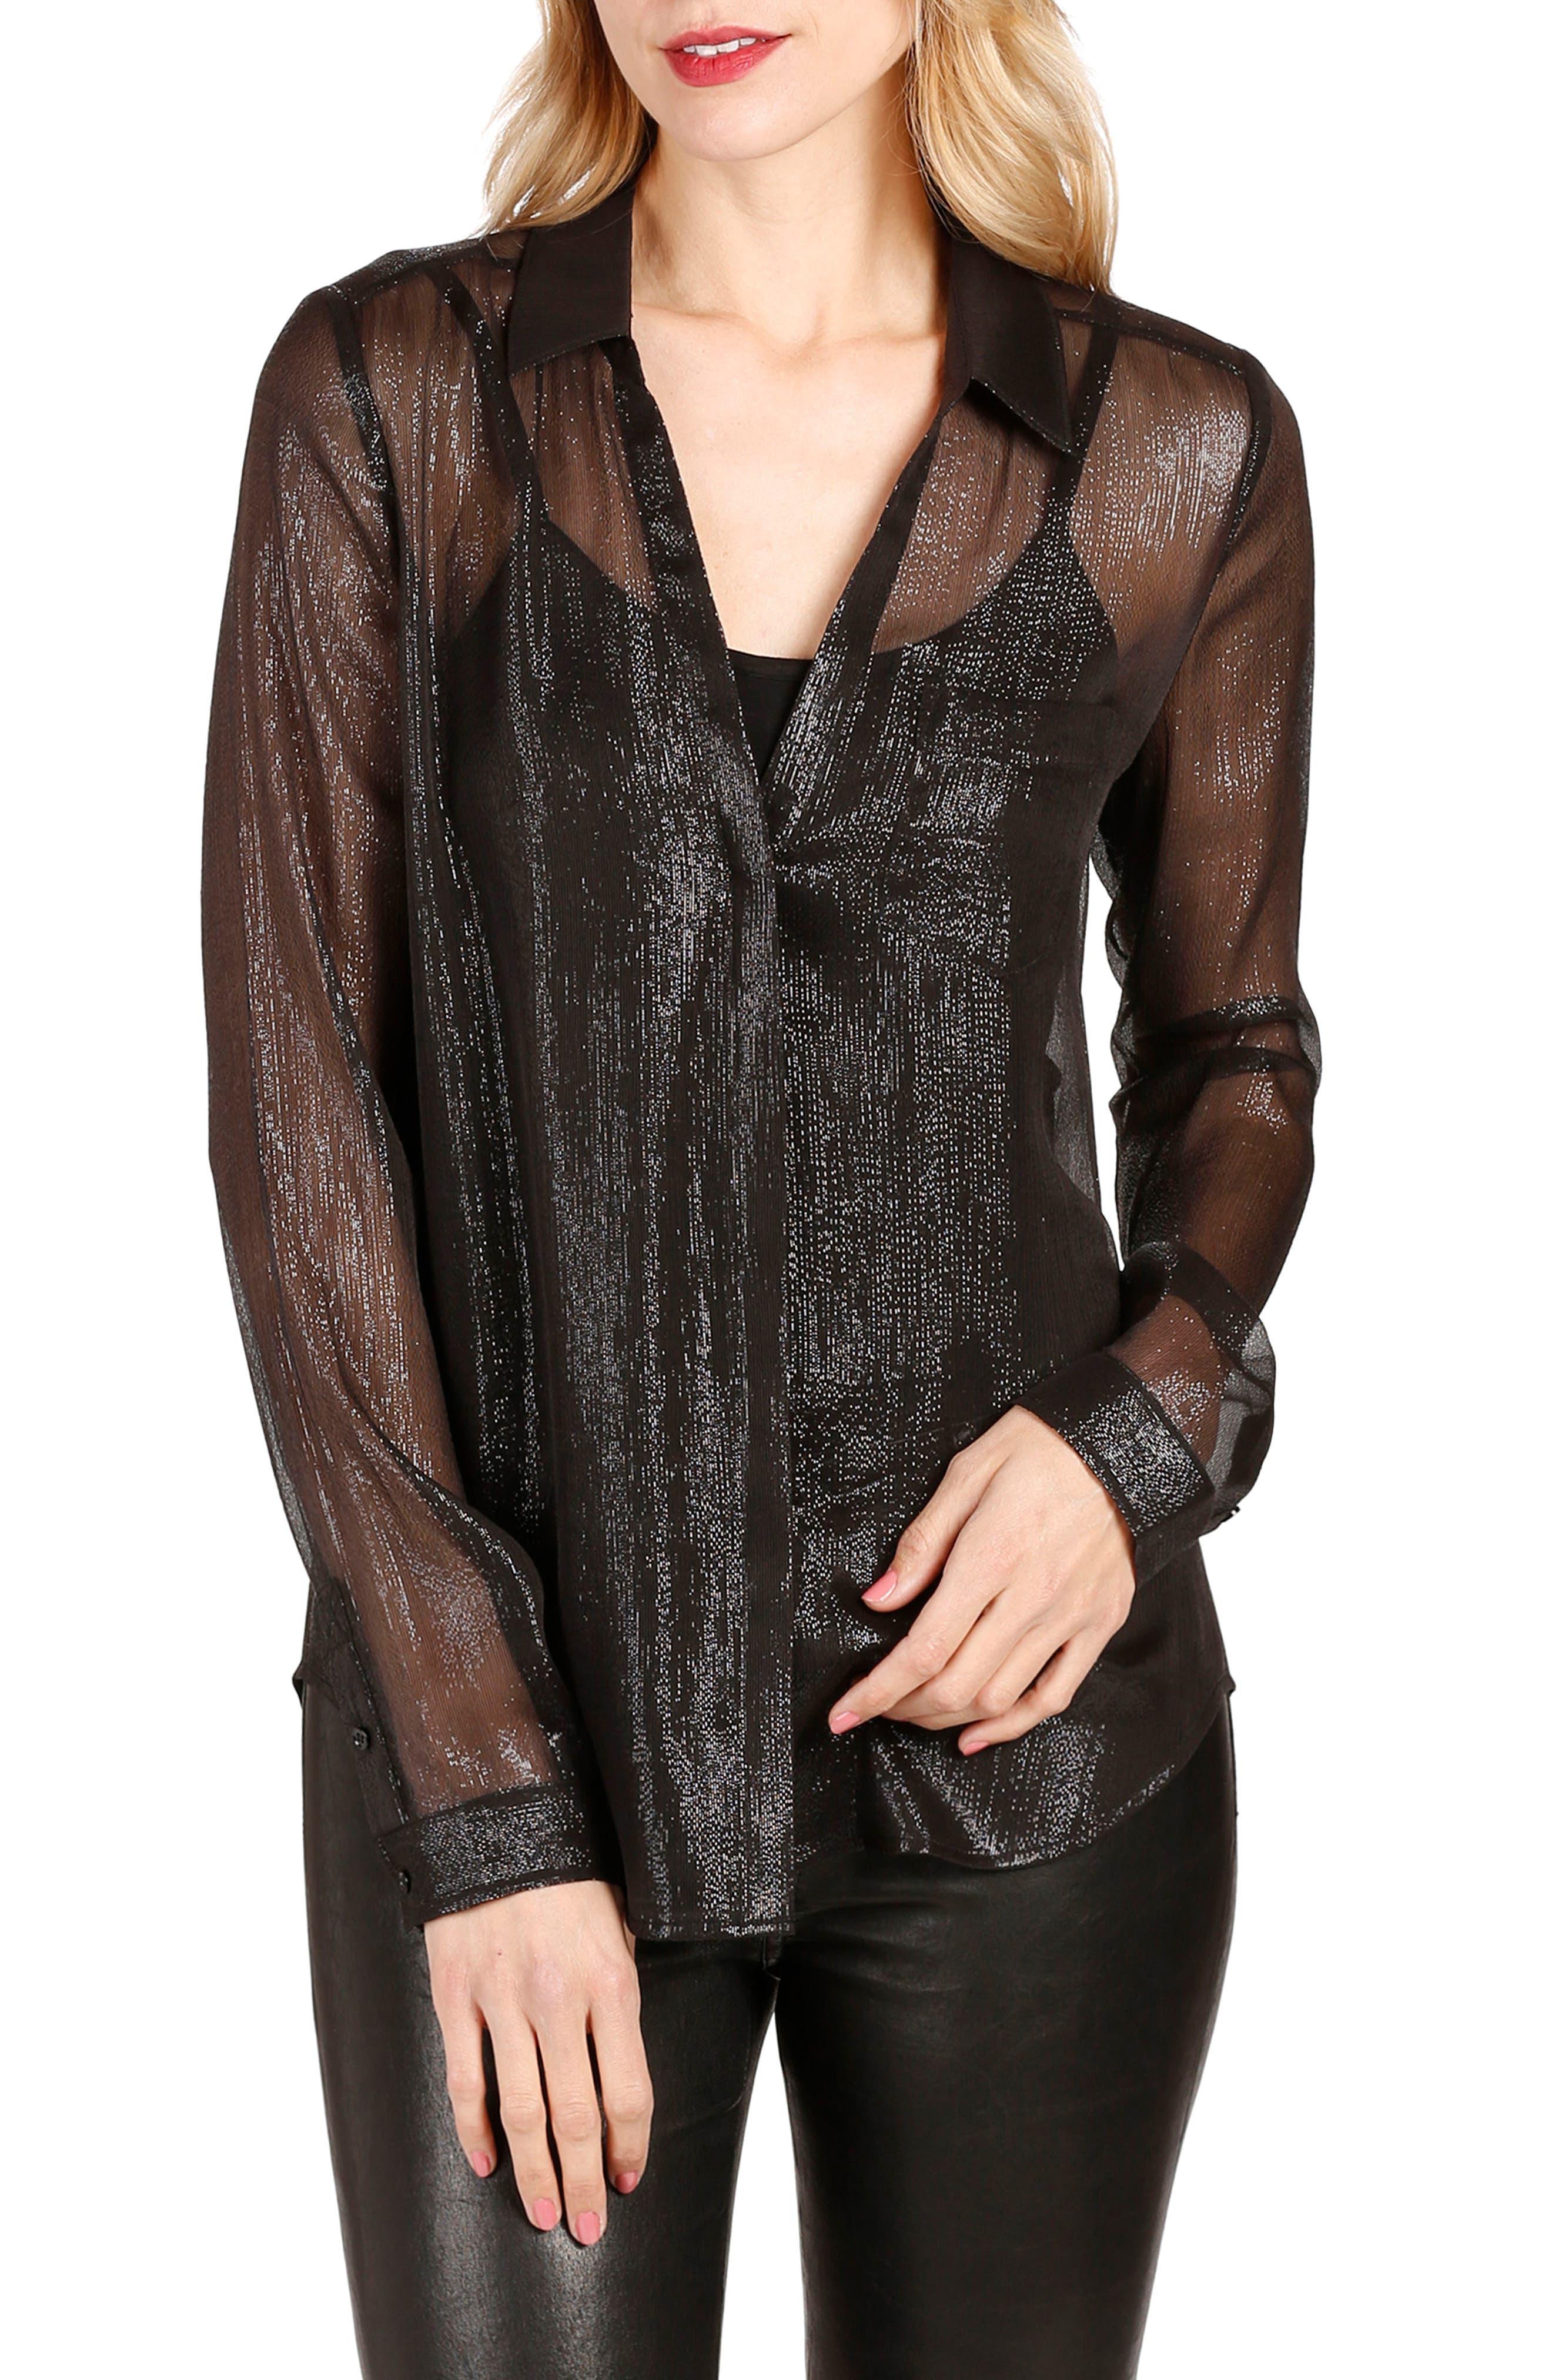 Everleigh Shirt,                         Main,                         color, Black